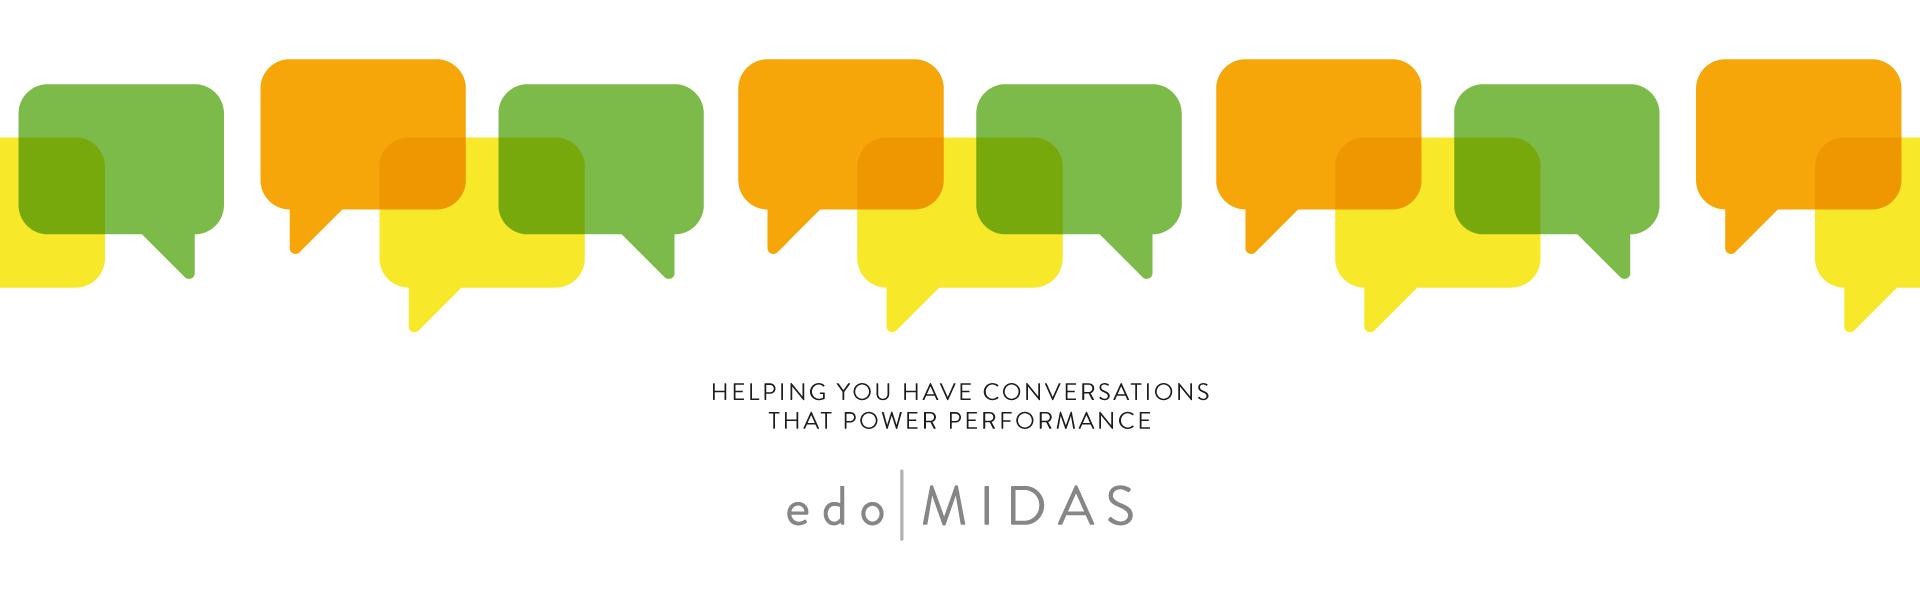 edoMidas Limited